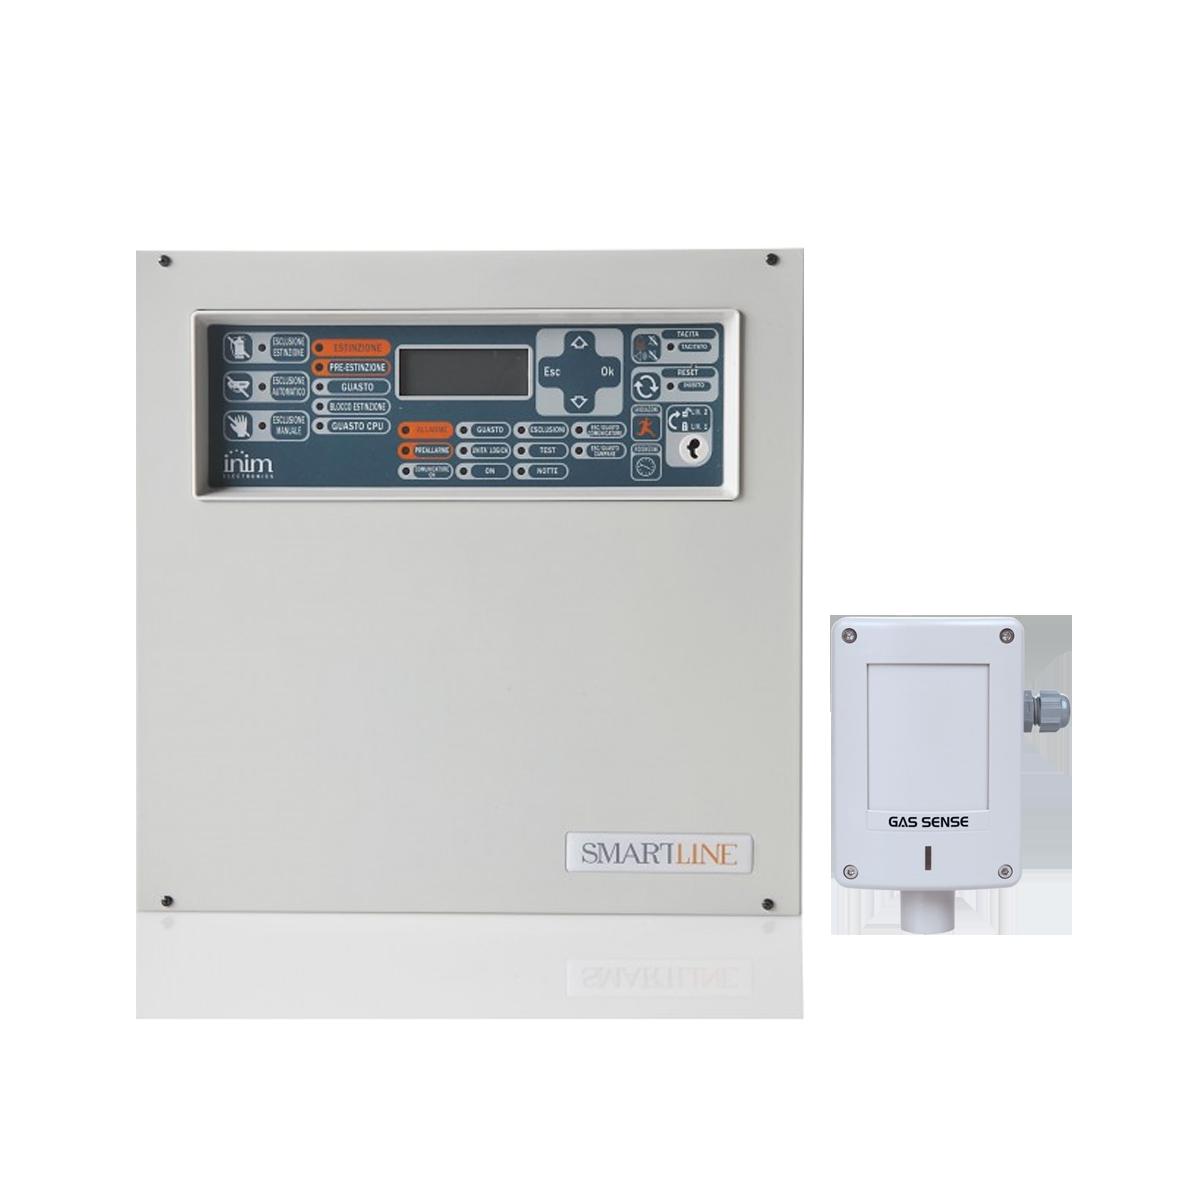 Kit Central de Gás 2 zonas e 1 Detetor INIM/GAS SENSE